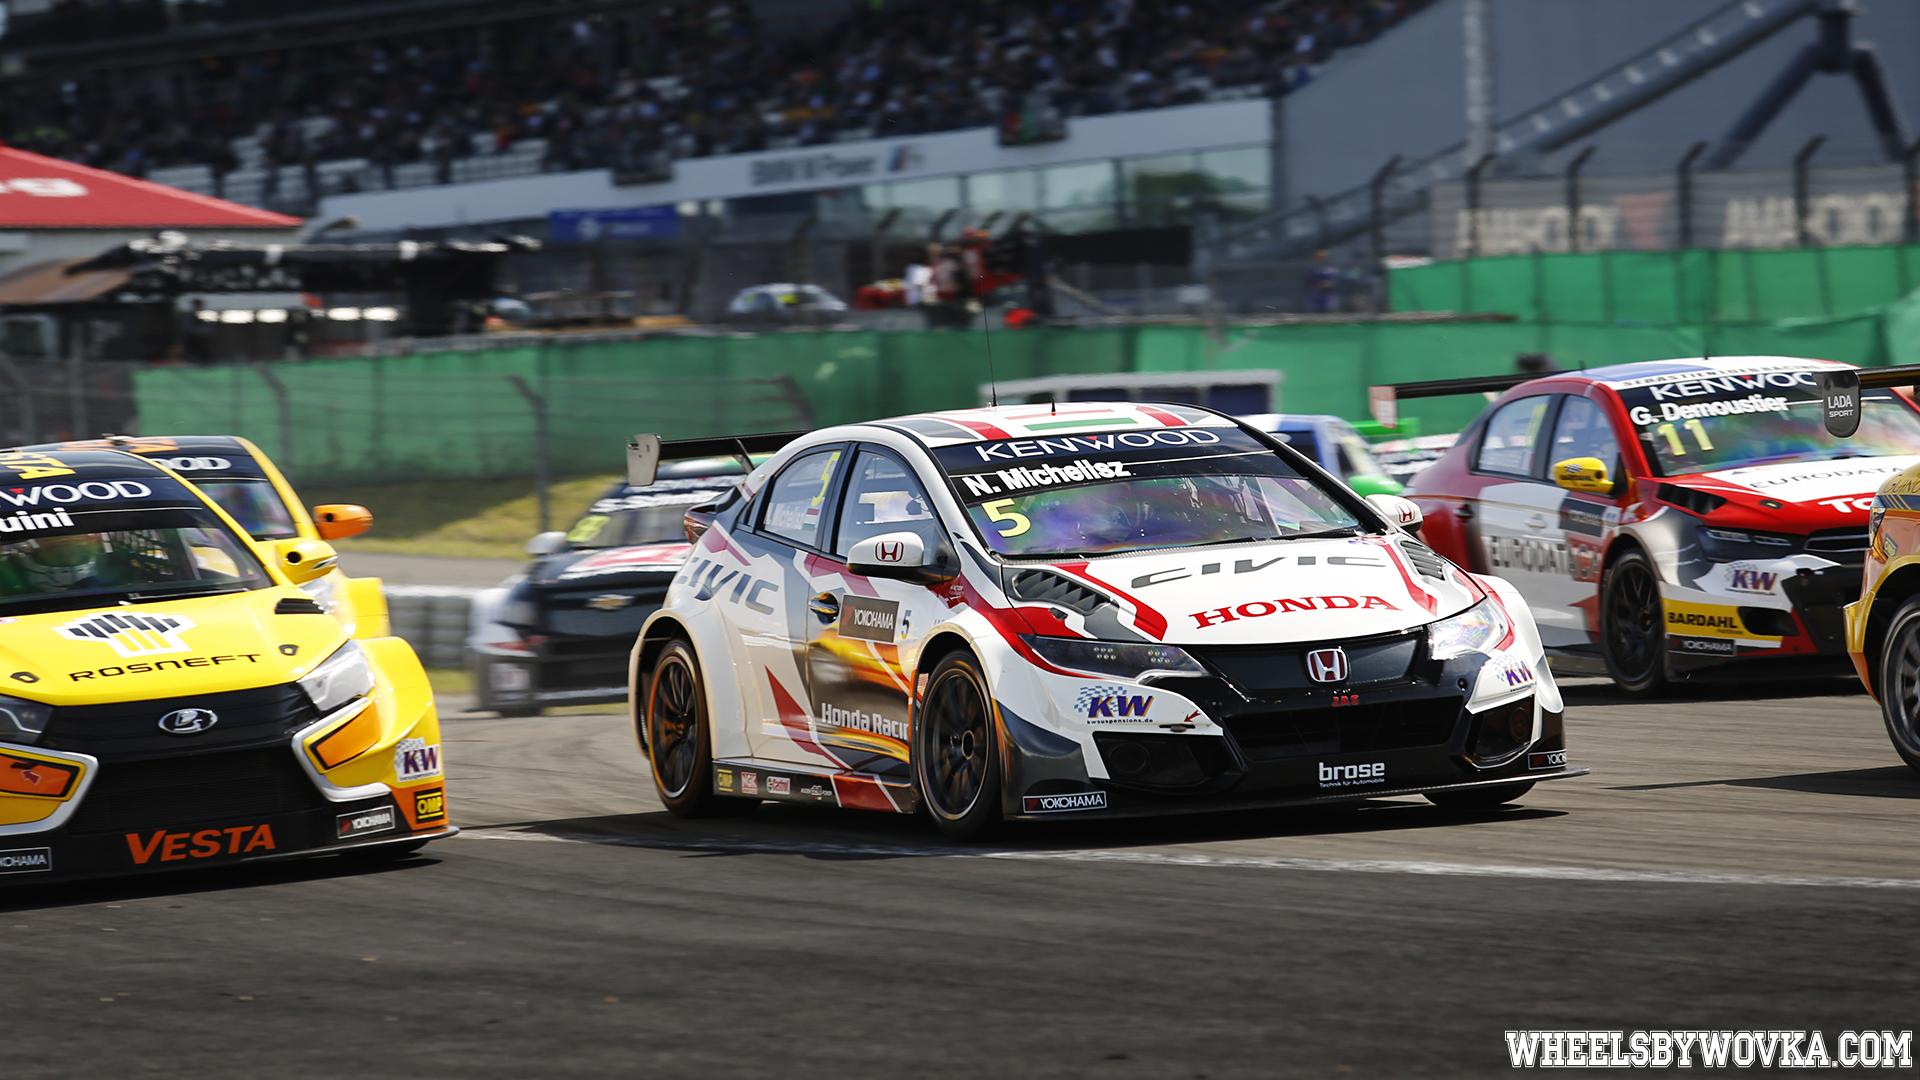 4-wtcc-nurburgring